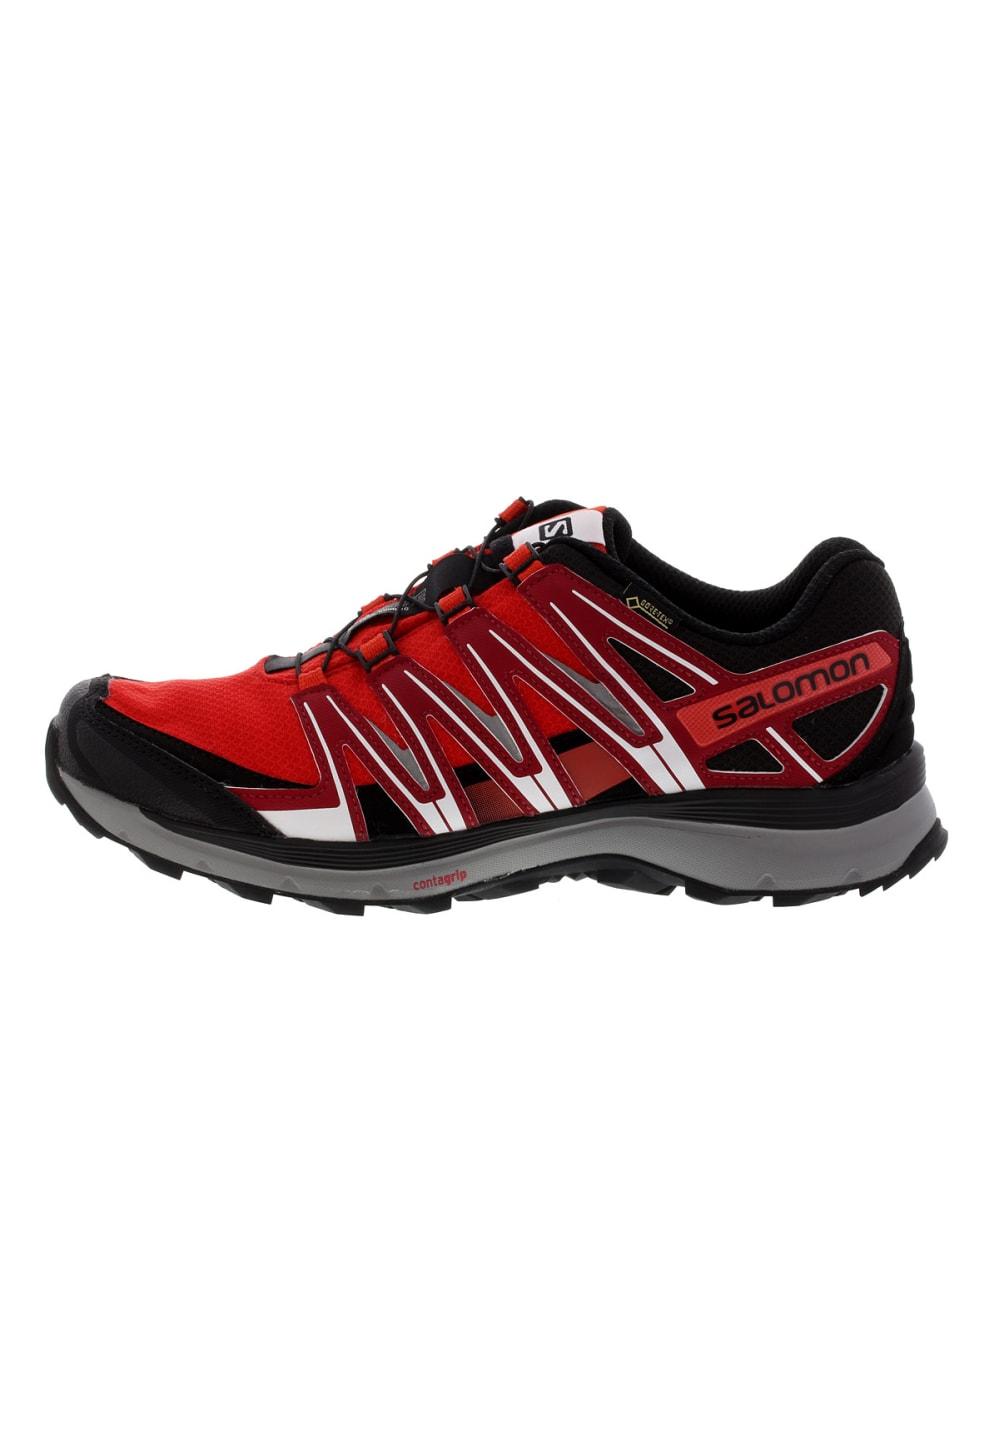 b7931576 Salomon XA Lite GTX - Running shoes for Men - Red | 21RUN